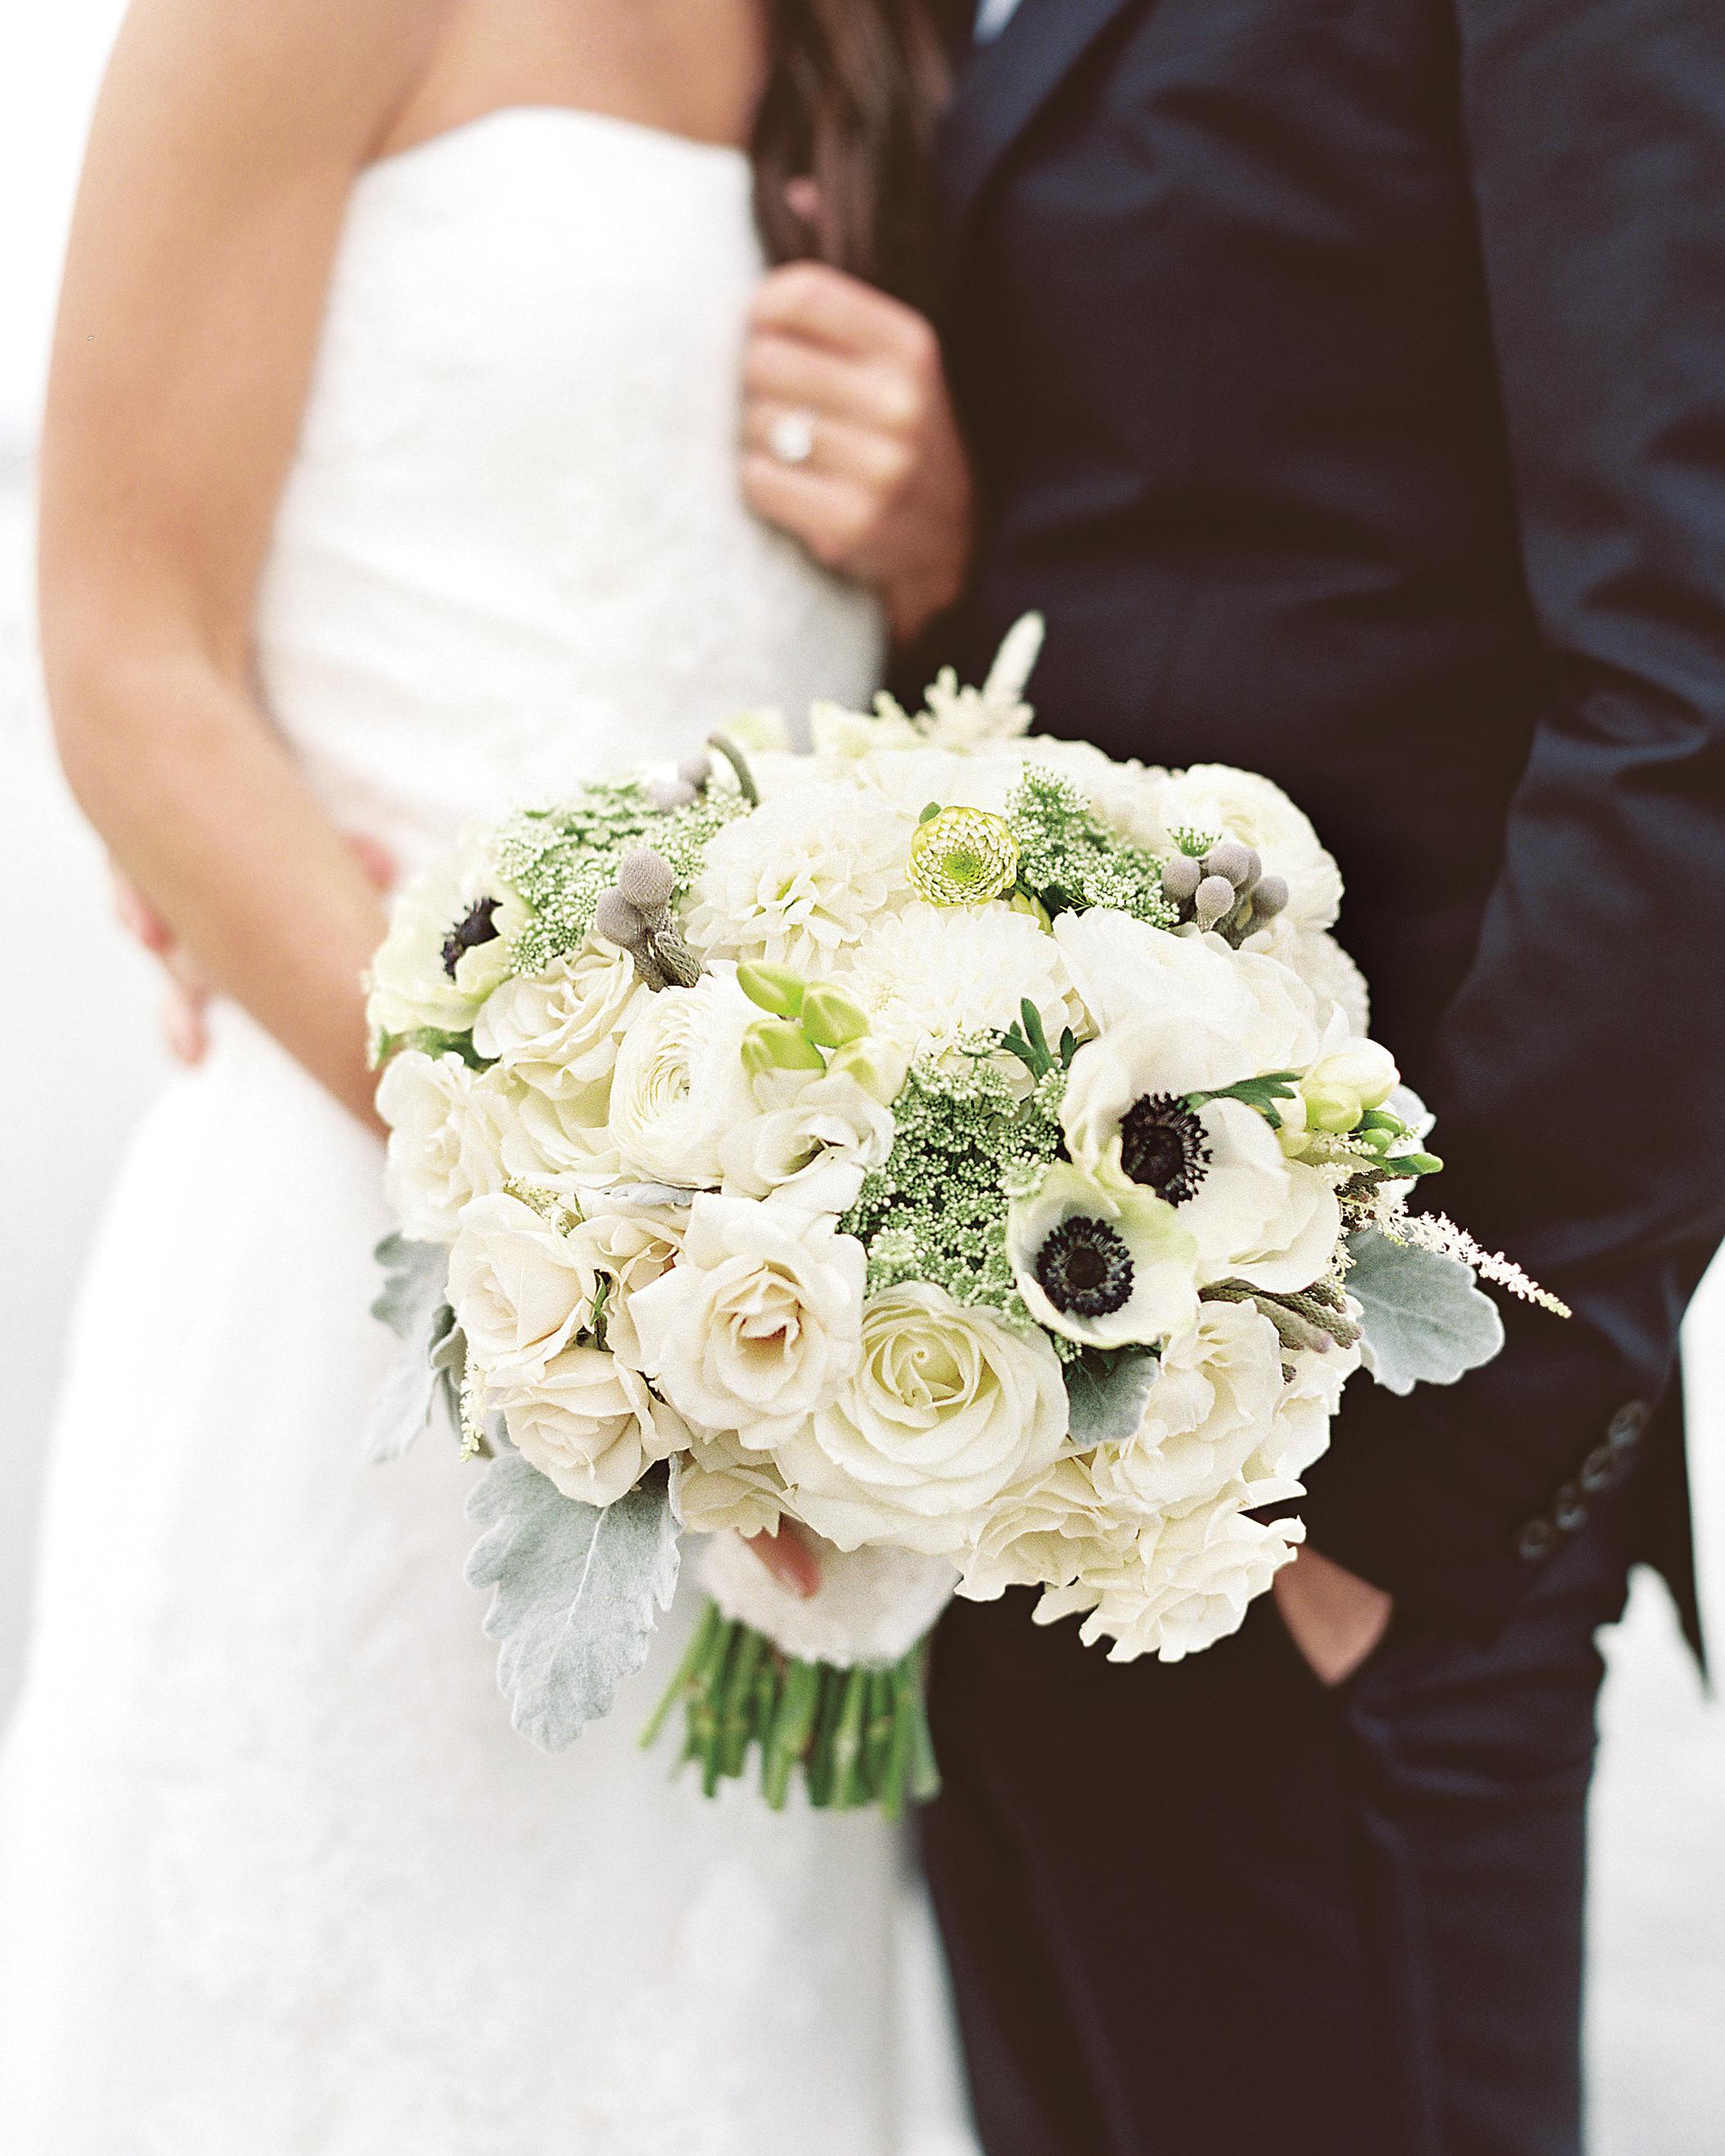 bride-groom-dsc-95-mwds110870.jpg